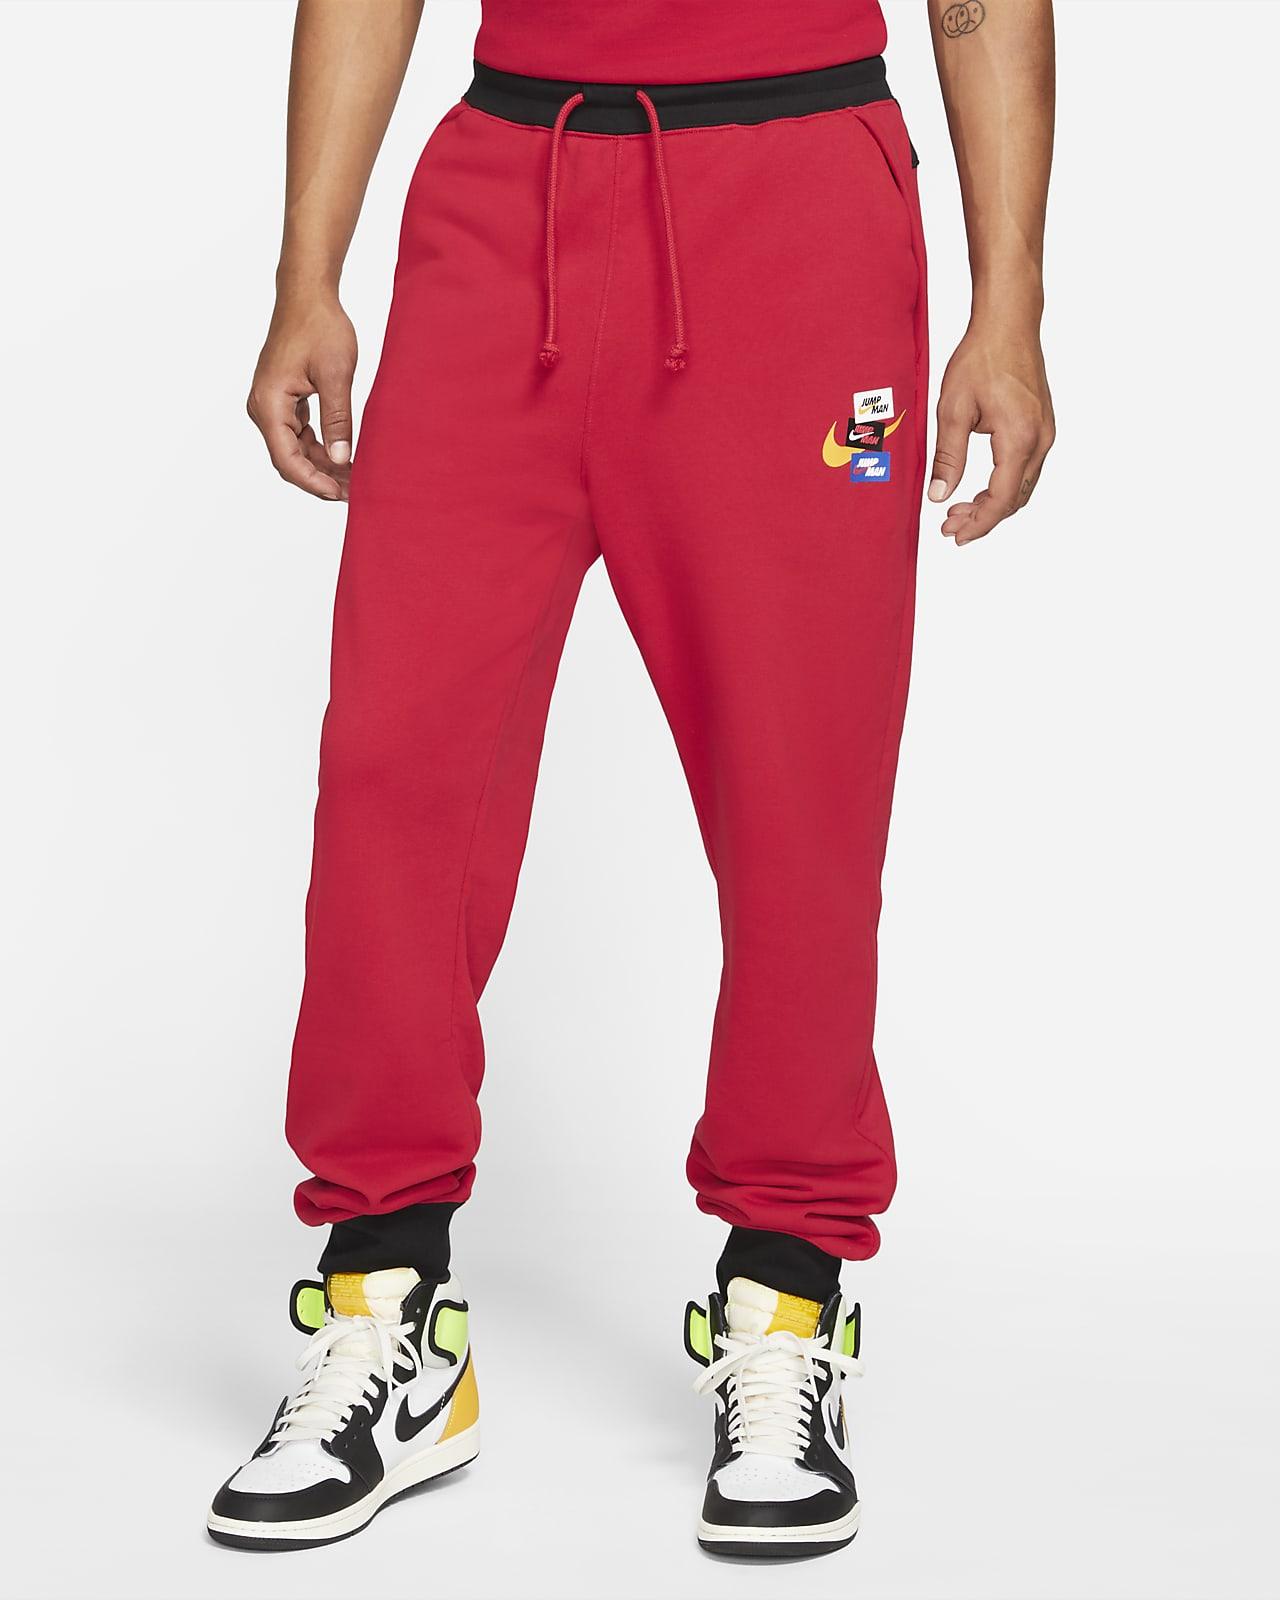 Jordan Jumpman Pantalons - Home